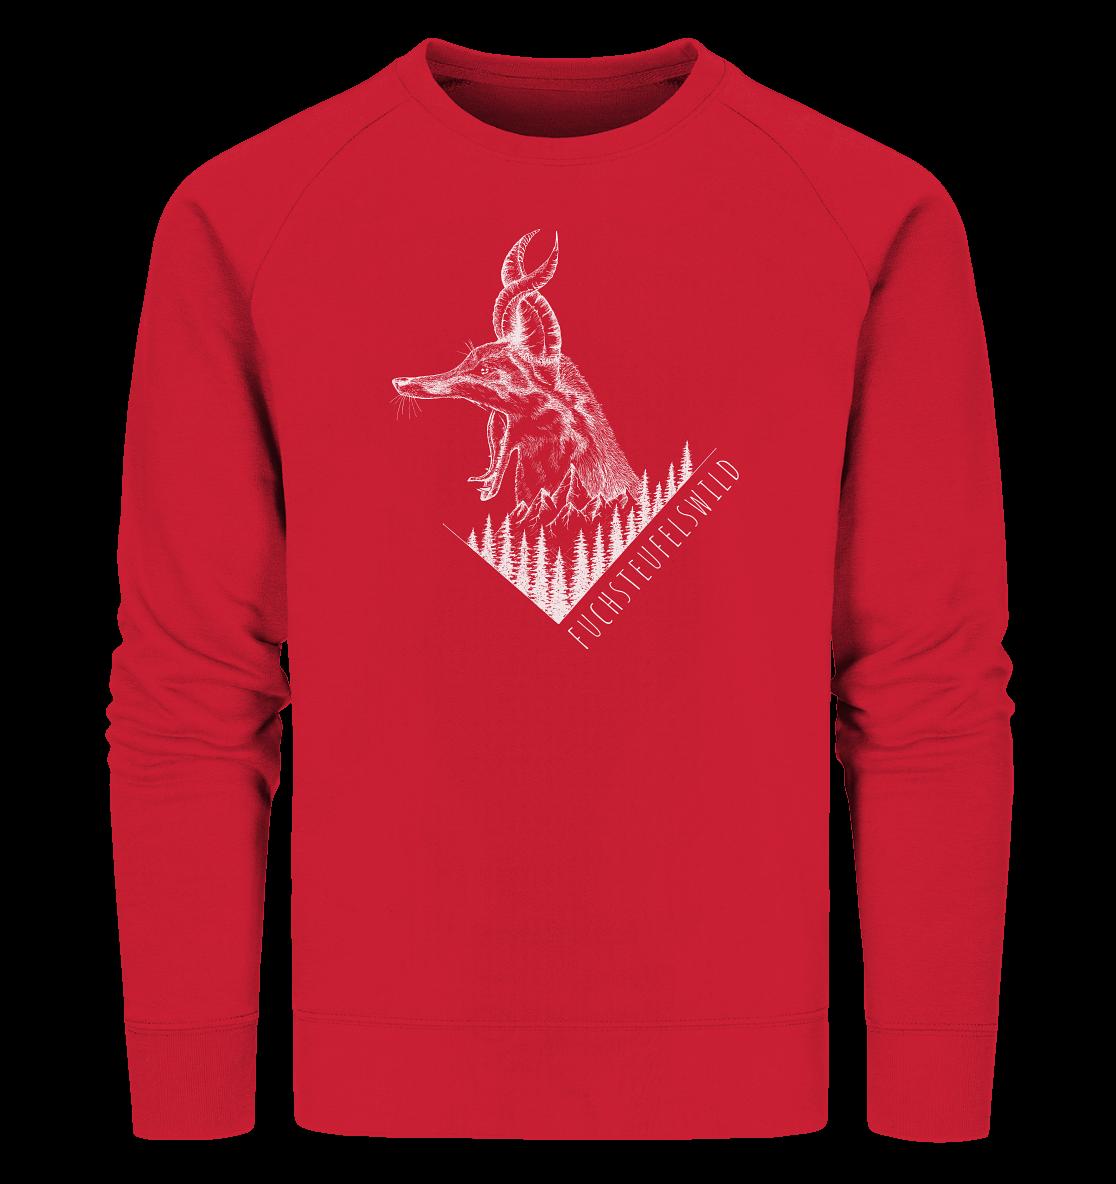 front-organic-sweatshirt-cb1f34-1116x-2.png